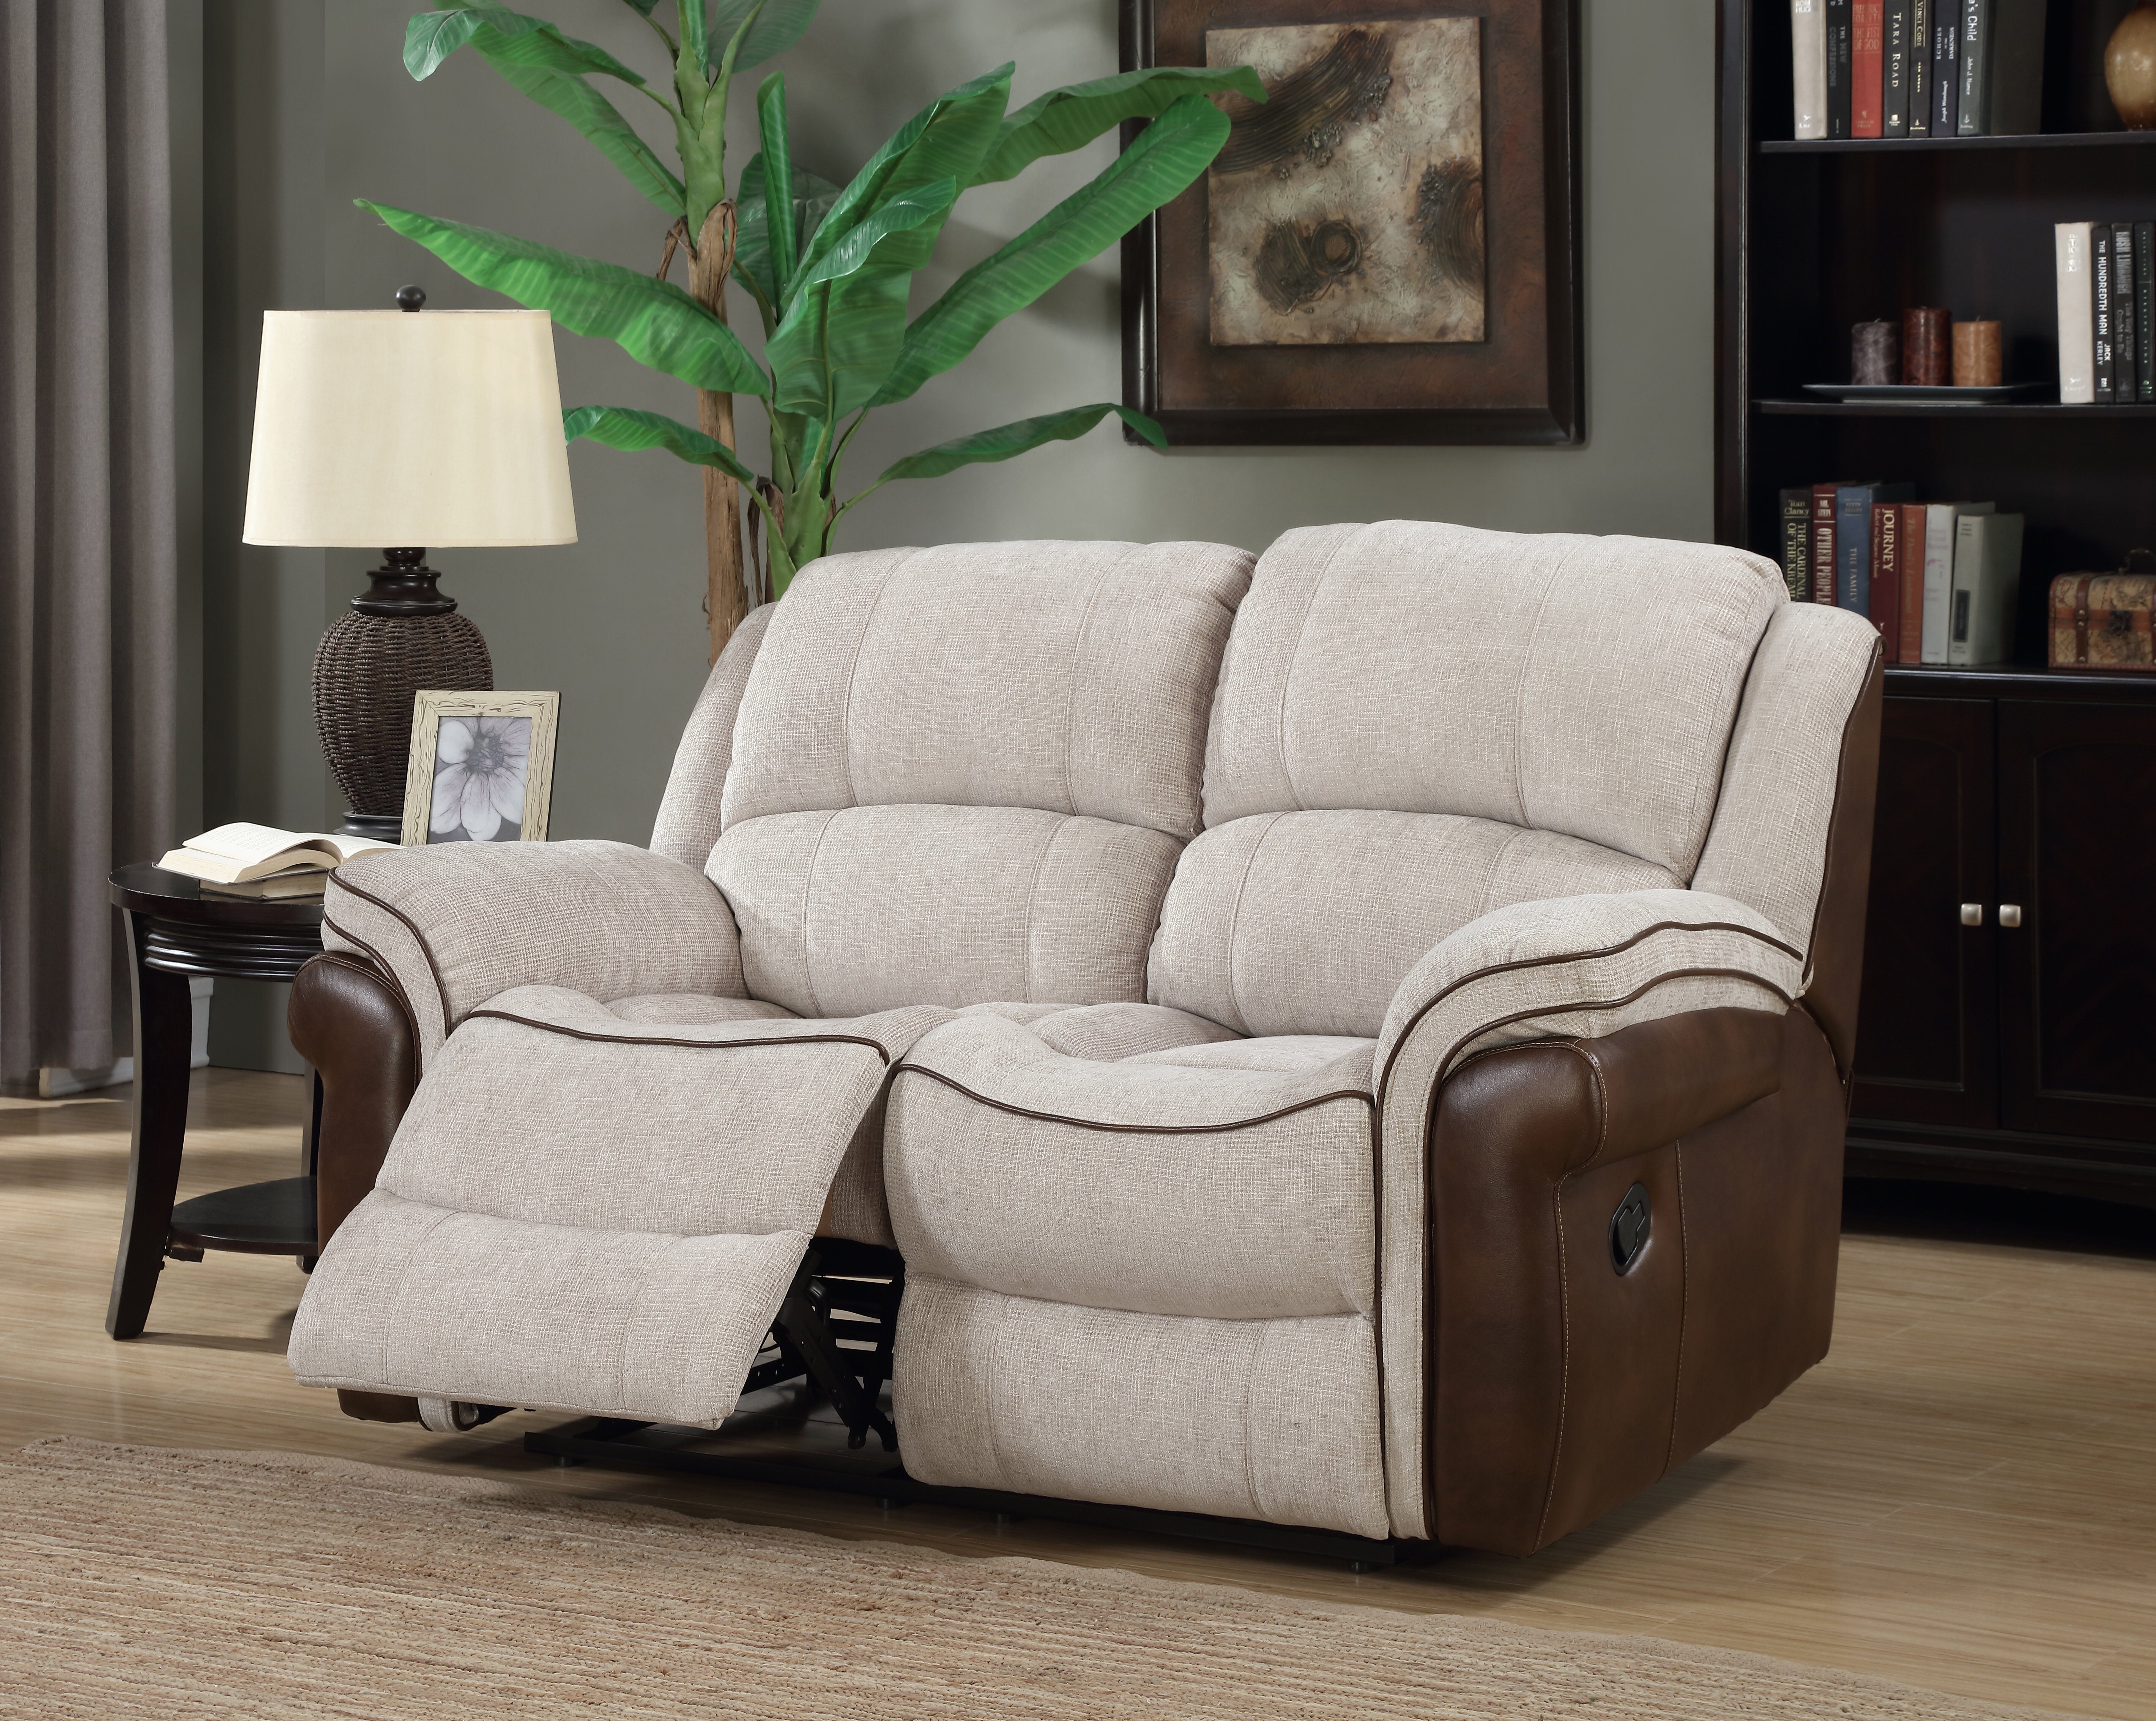 Brayden Studio Cowling 2 Seater Reclining Sofa U0026 Reviews ...